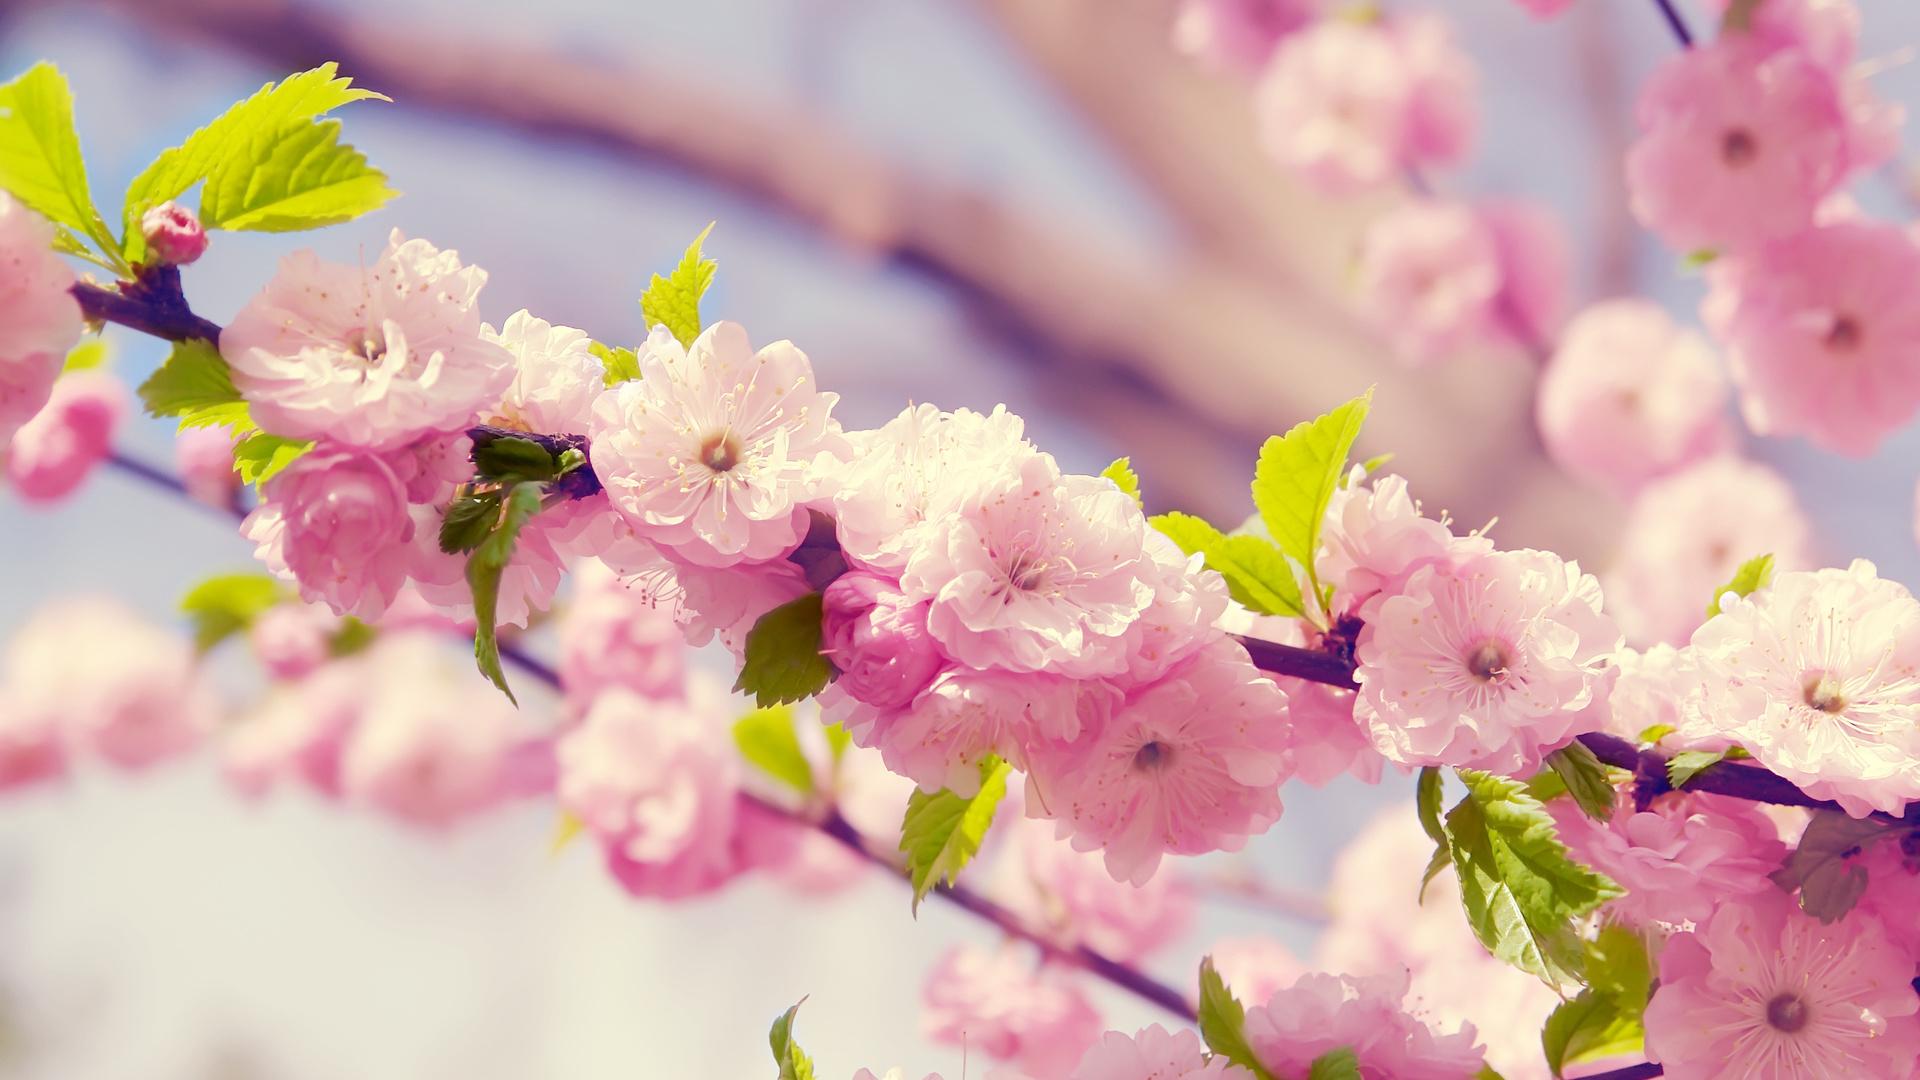 весна, Сакура, цветы, лепестки, вишня.ветка, цветение